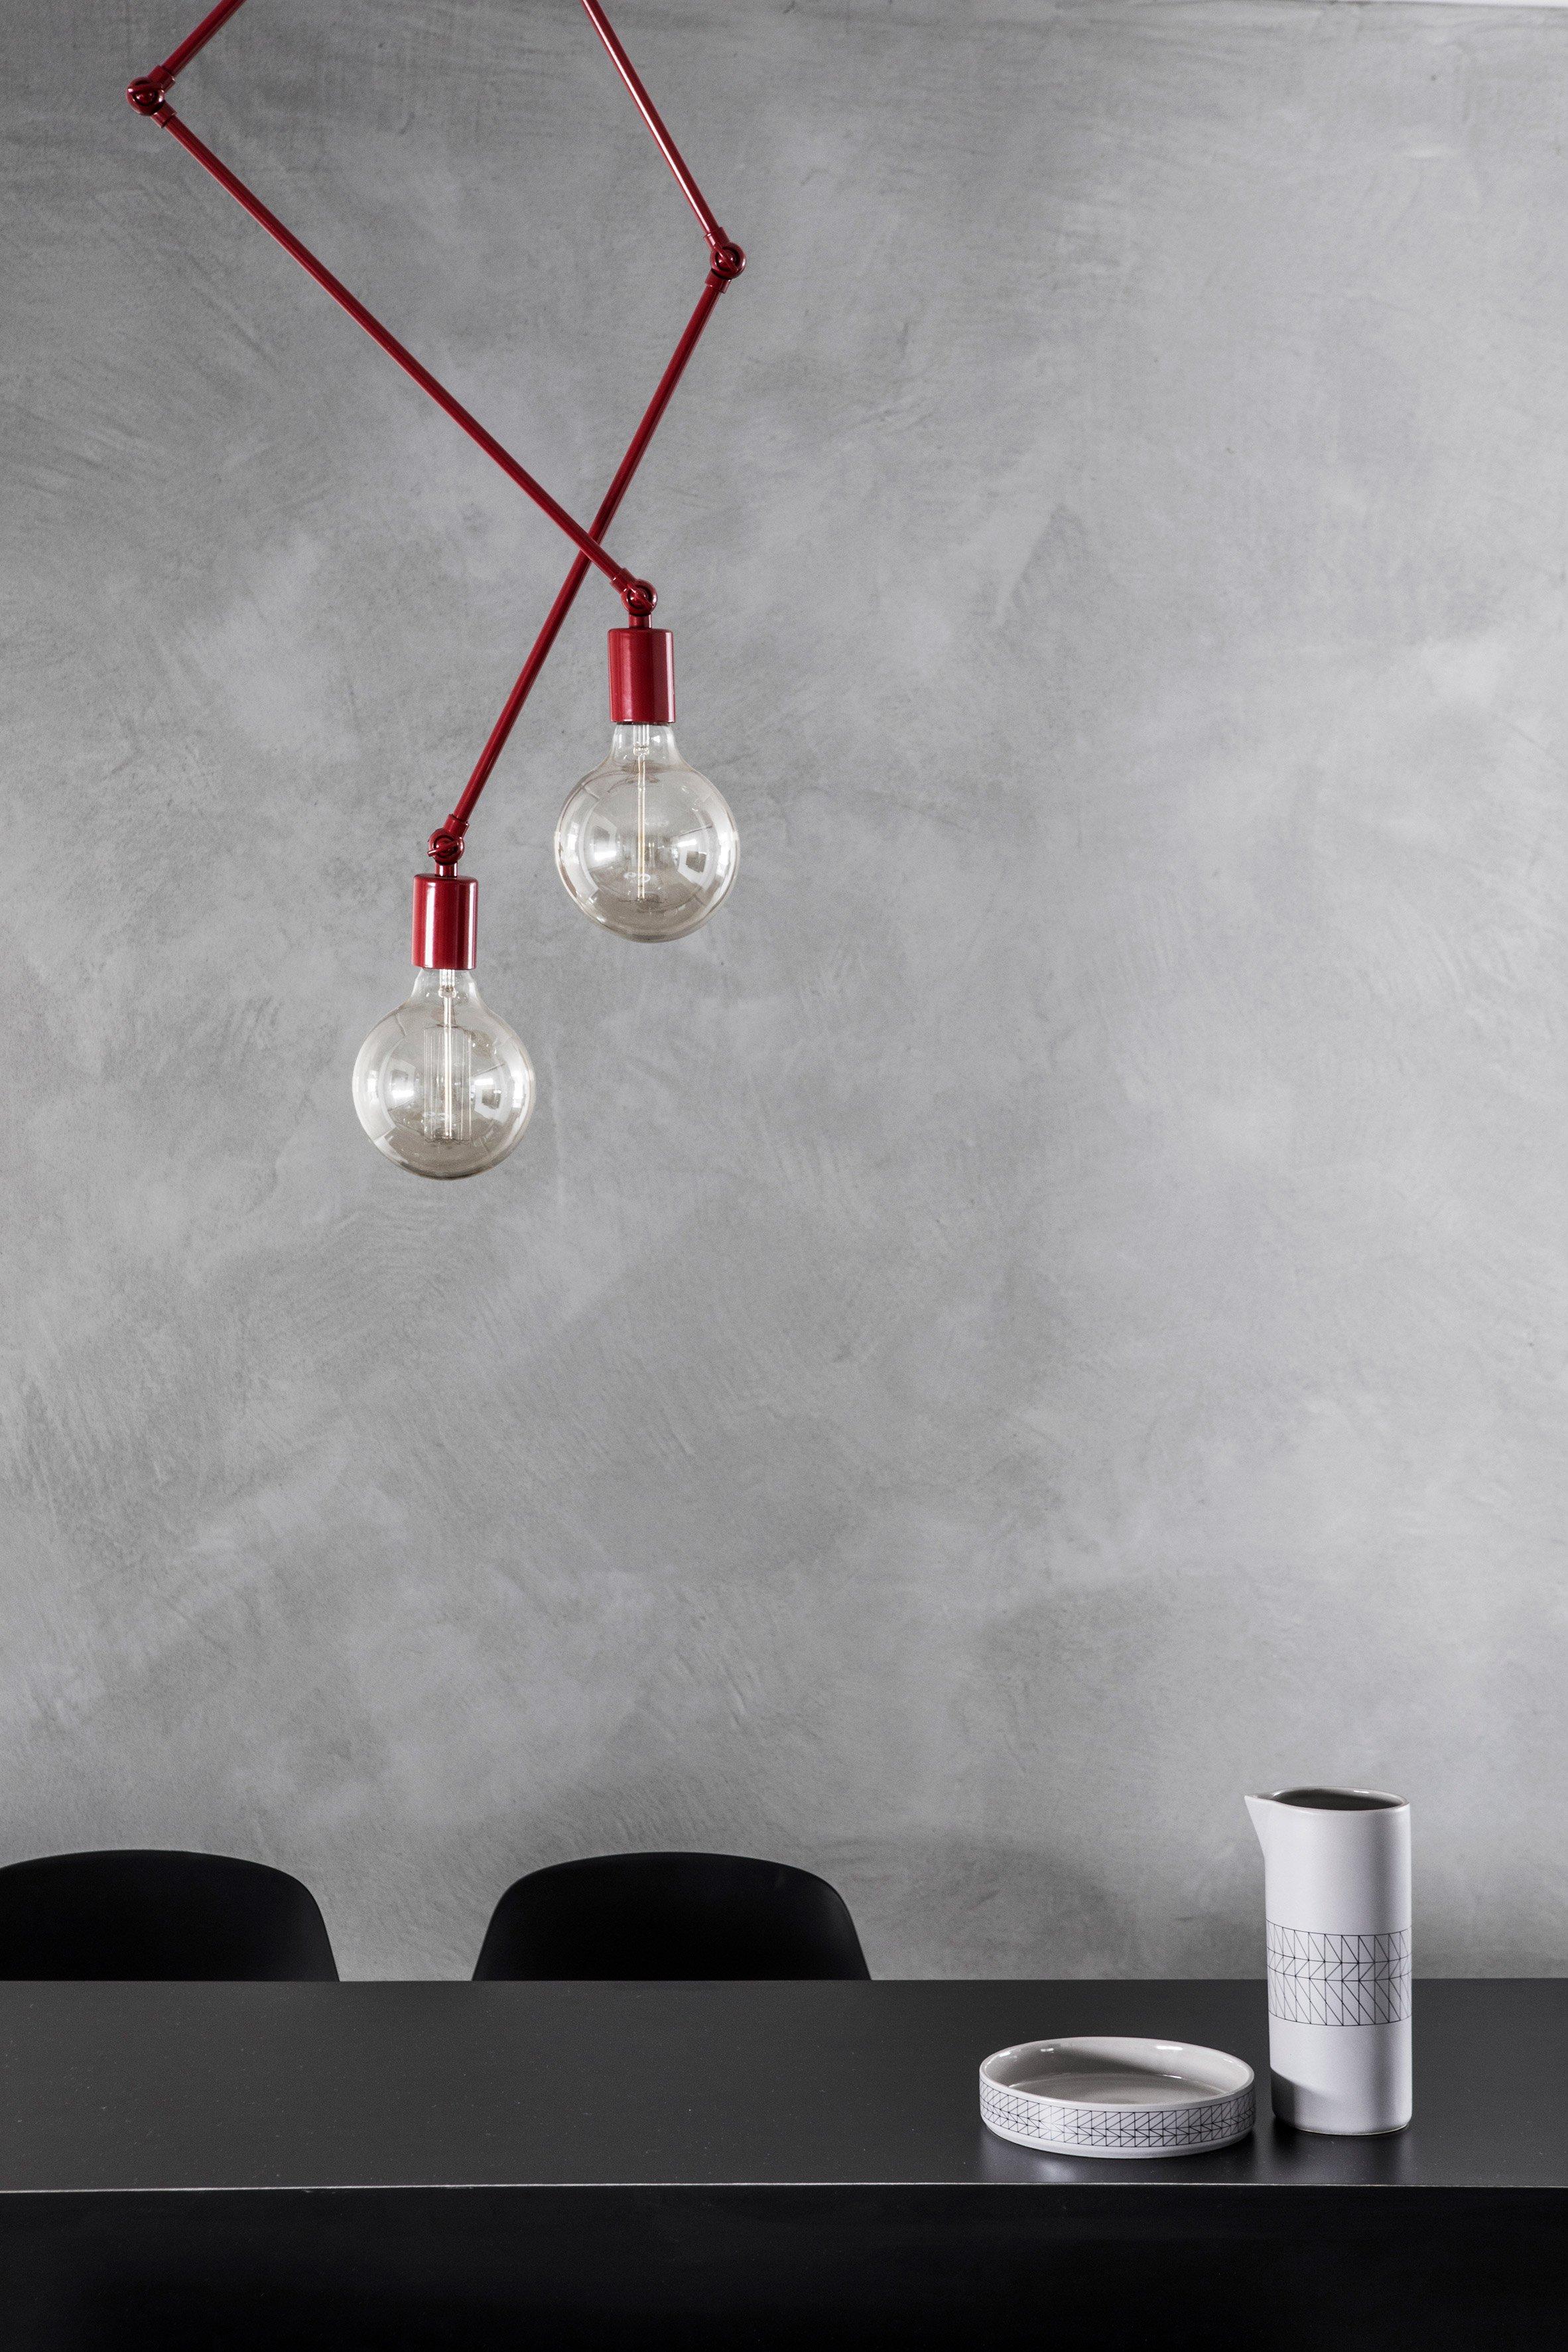 residence-interiors-design-studia-osnovadesign-osnova-poltava_11